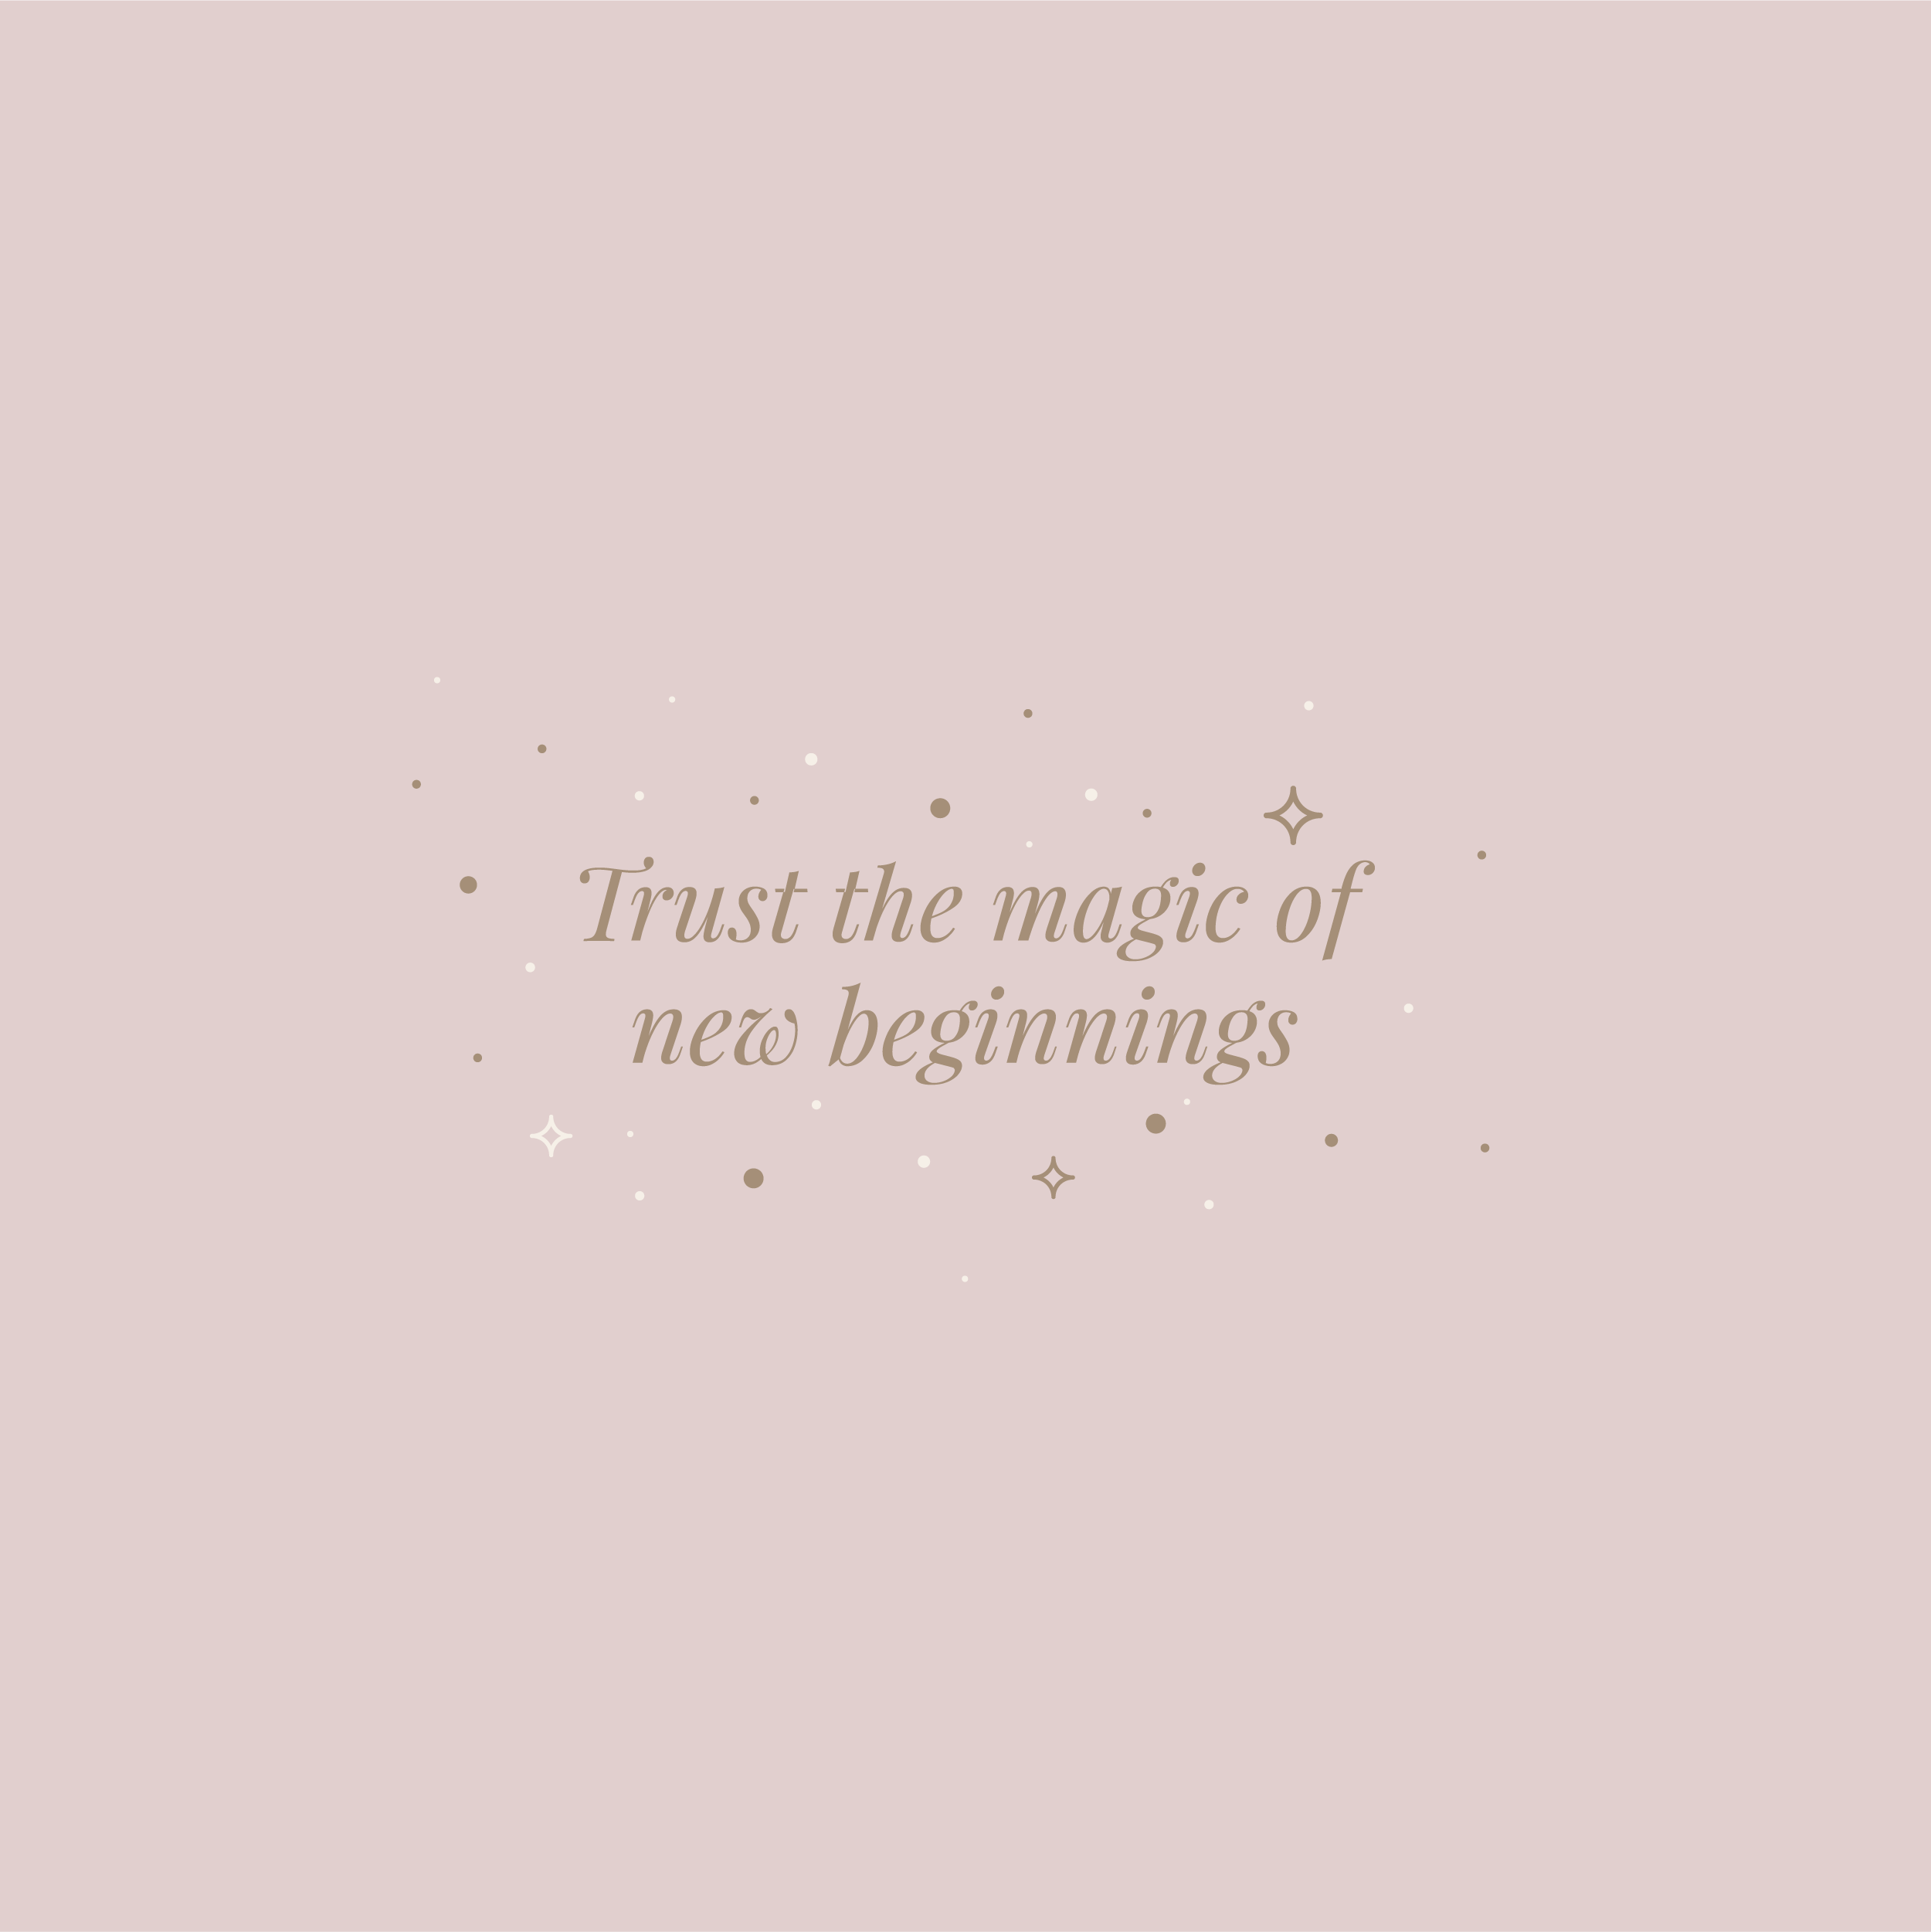 Trust The Magic Of New Beginnings Job Quotes New Job Quotes New Beginning Quotes